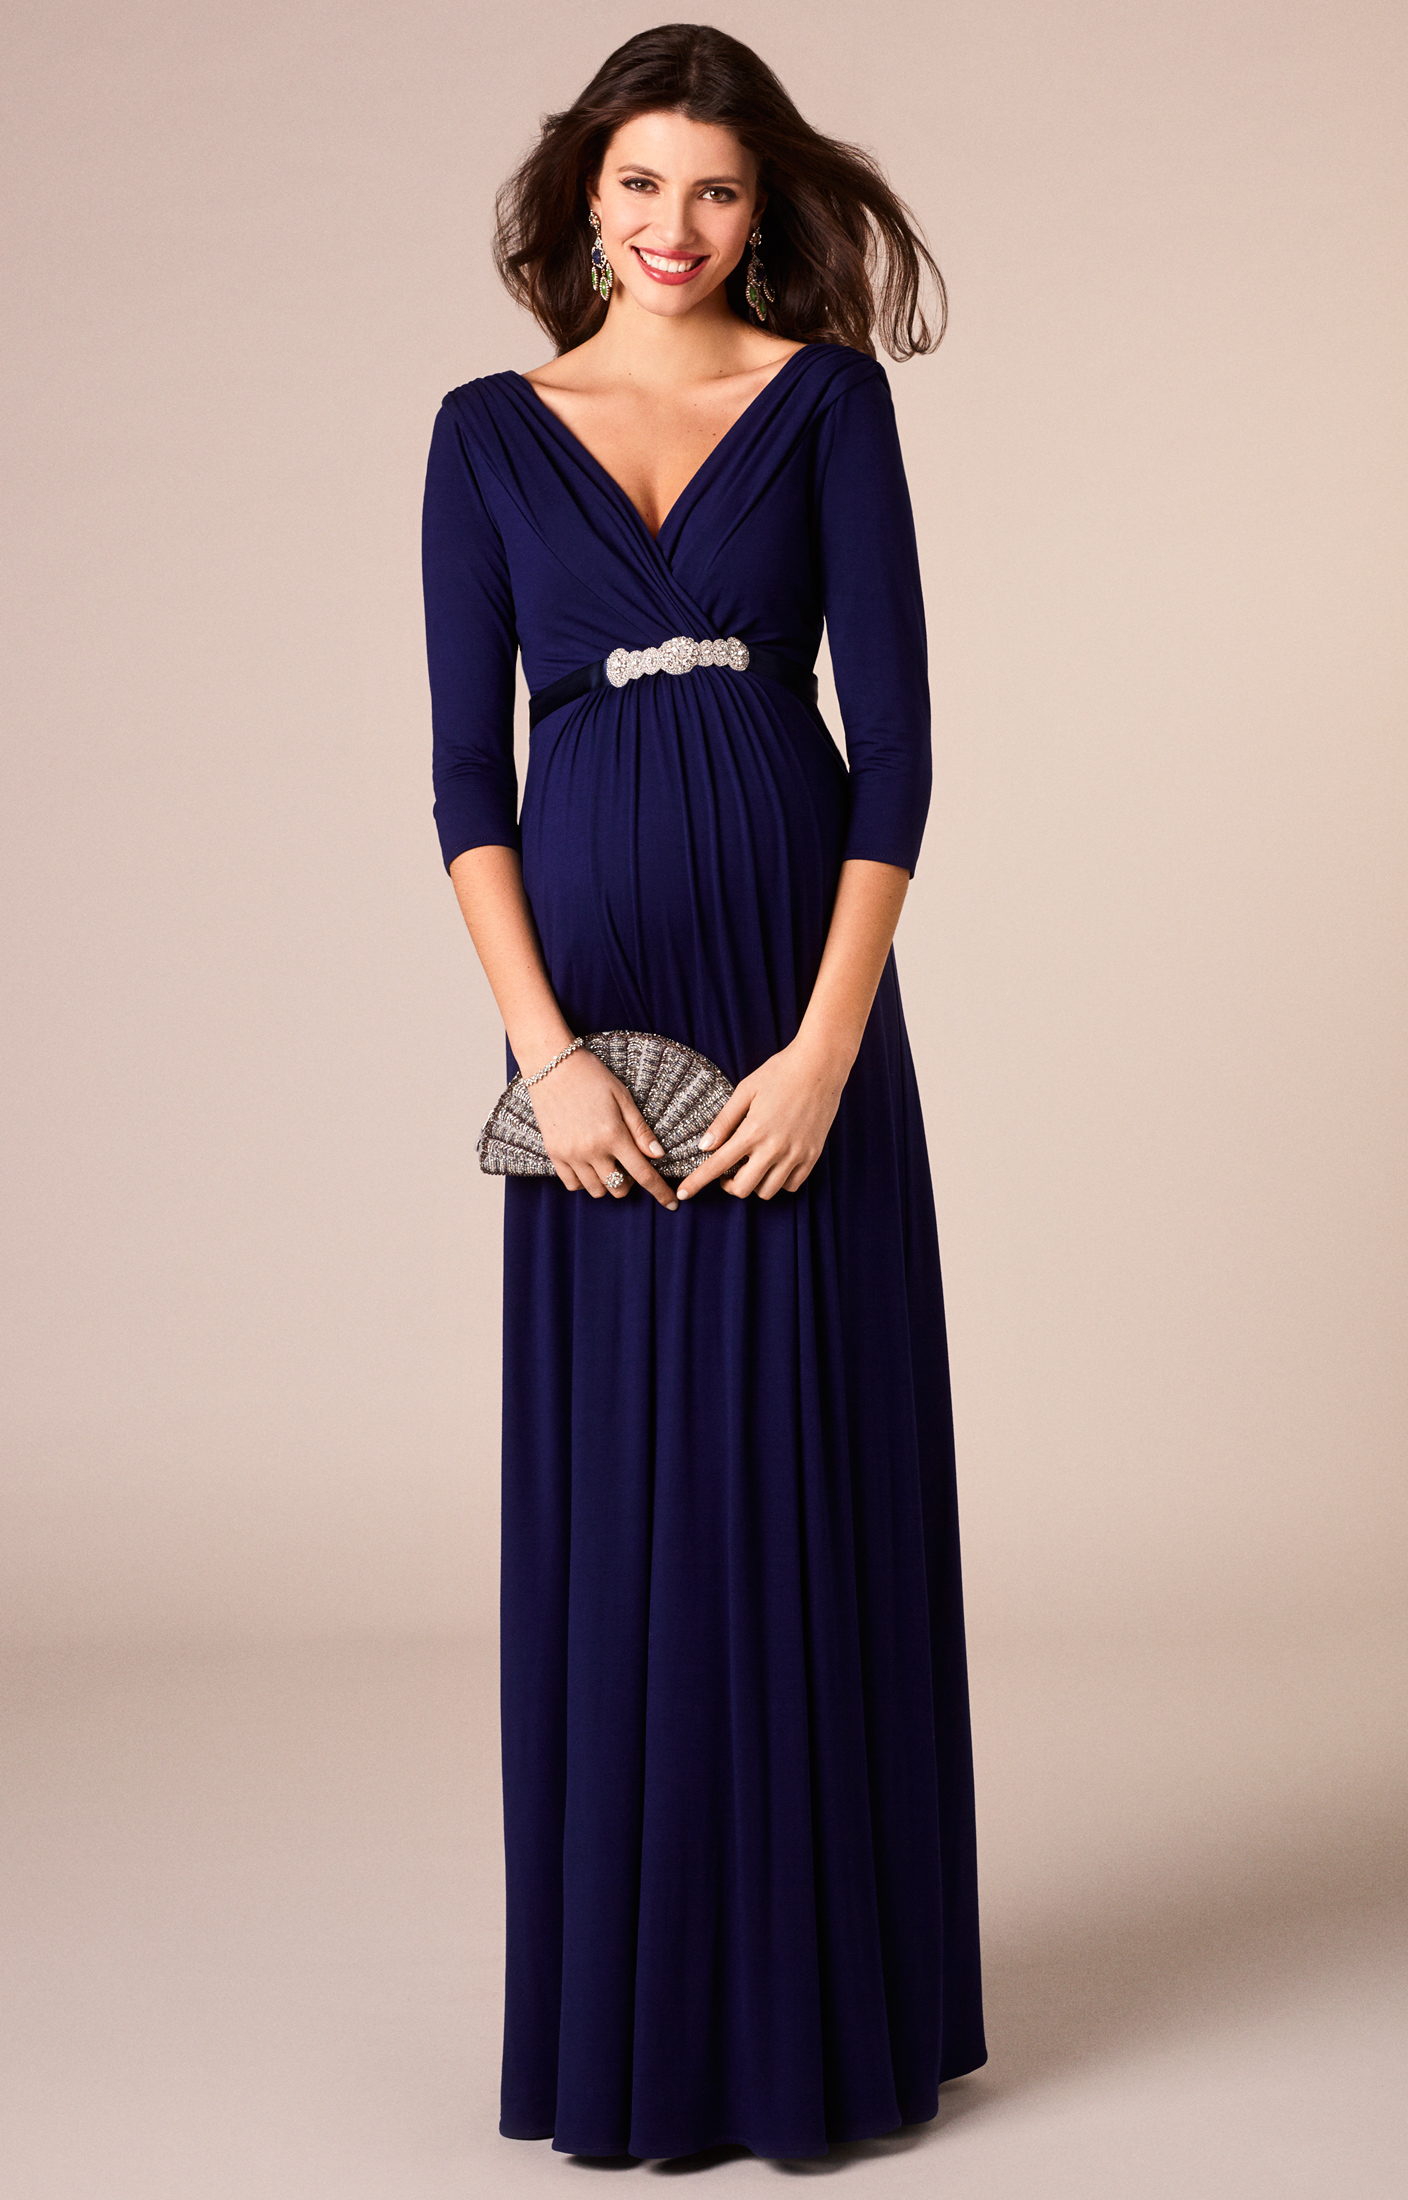 maternity formal evening dresses photo - 1